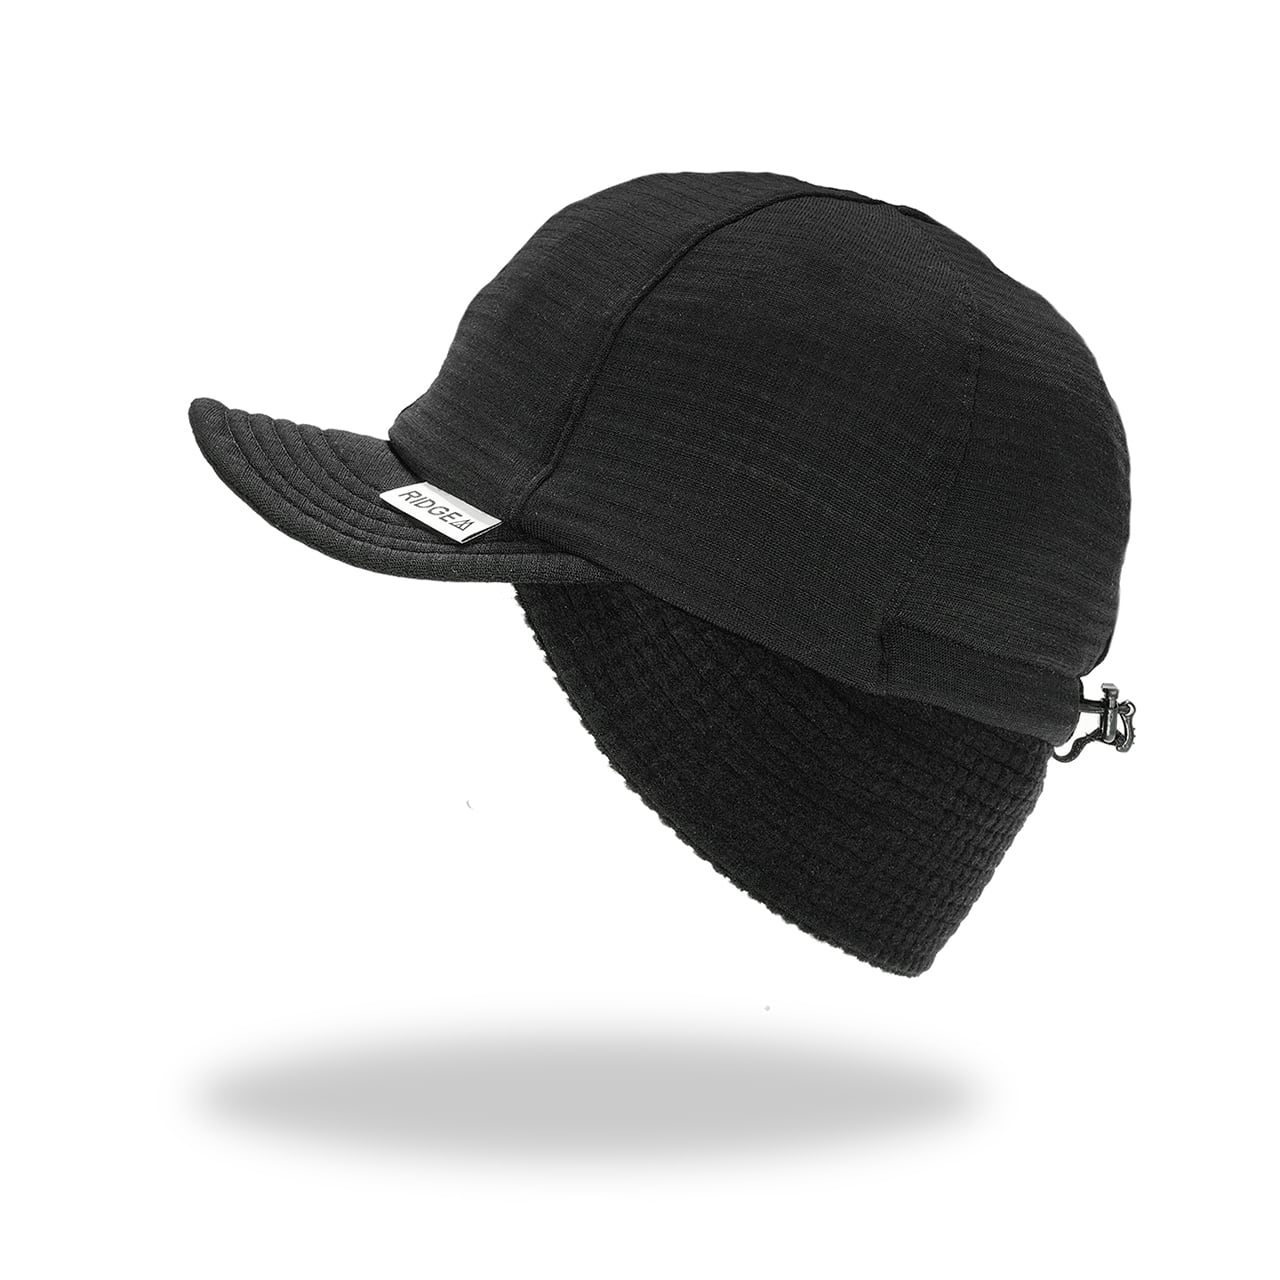 RIDGE MOUNTAIN GEAR / GRID MERINO EARMUFF CAP